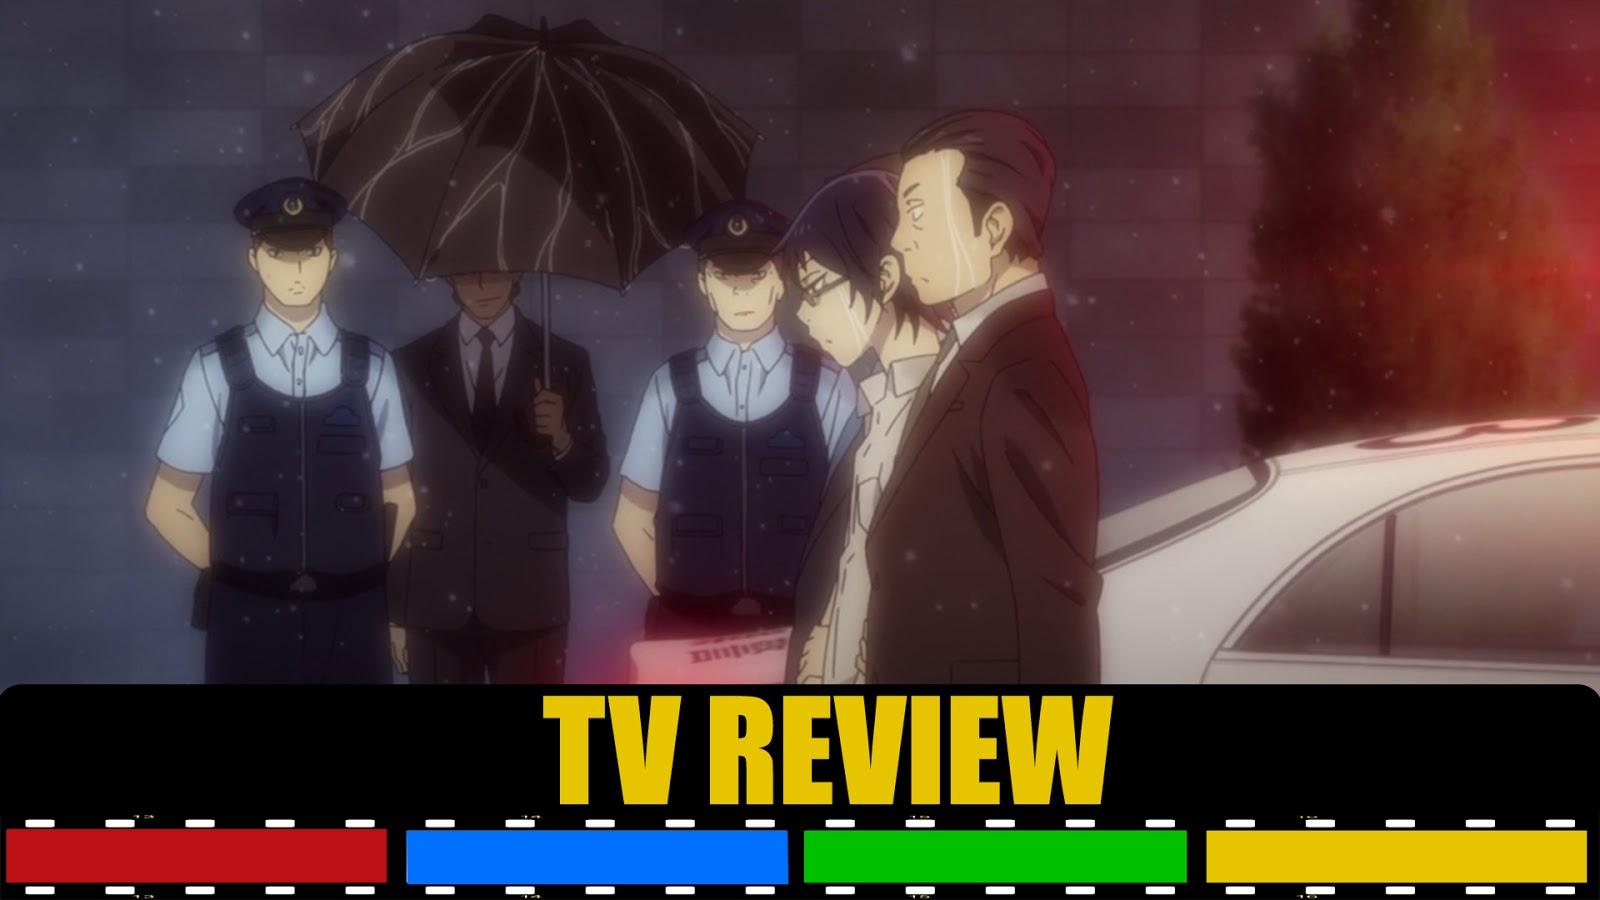 Boku Dake Ga Inai Machi Erased Episode 6 Grim Reaper TV Review